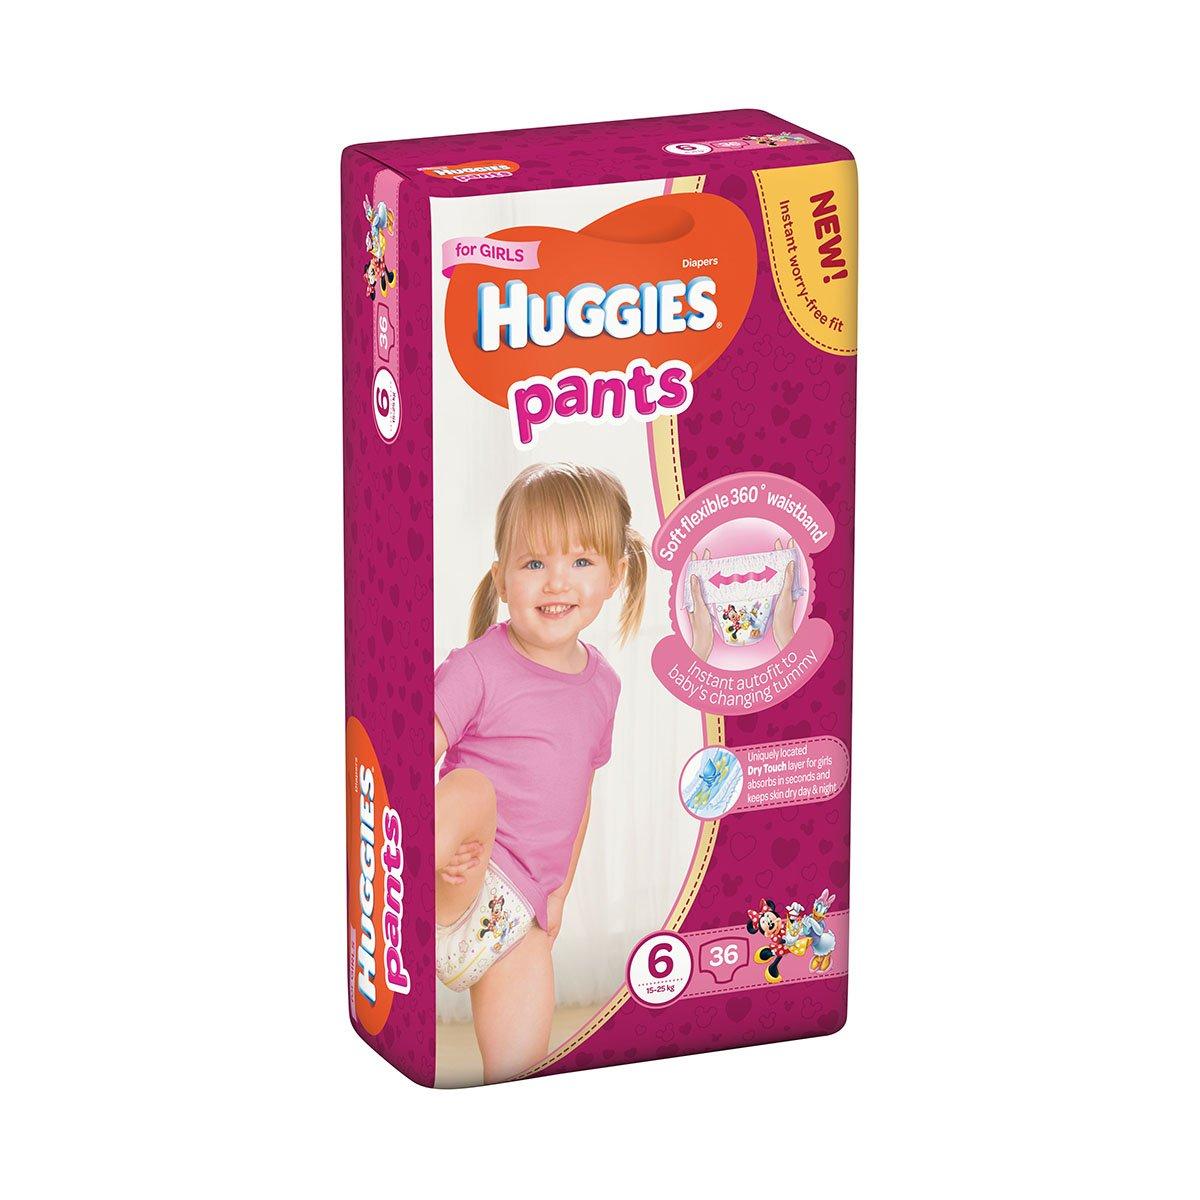 Scutece Huggies Mega Pants Girls, Nr 6, 15 - 25 Kg, 36 buc imagine